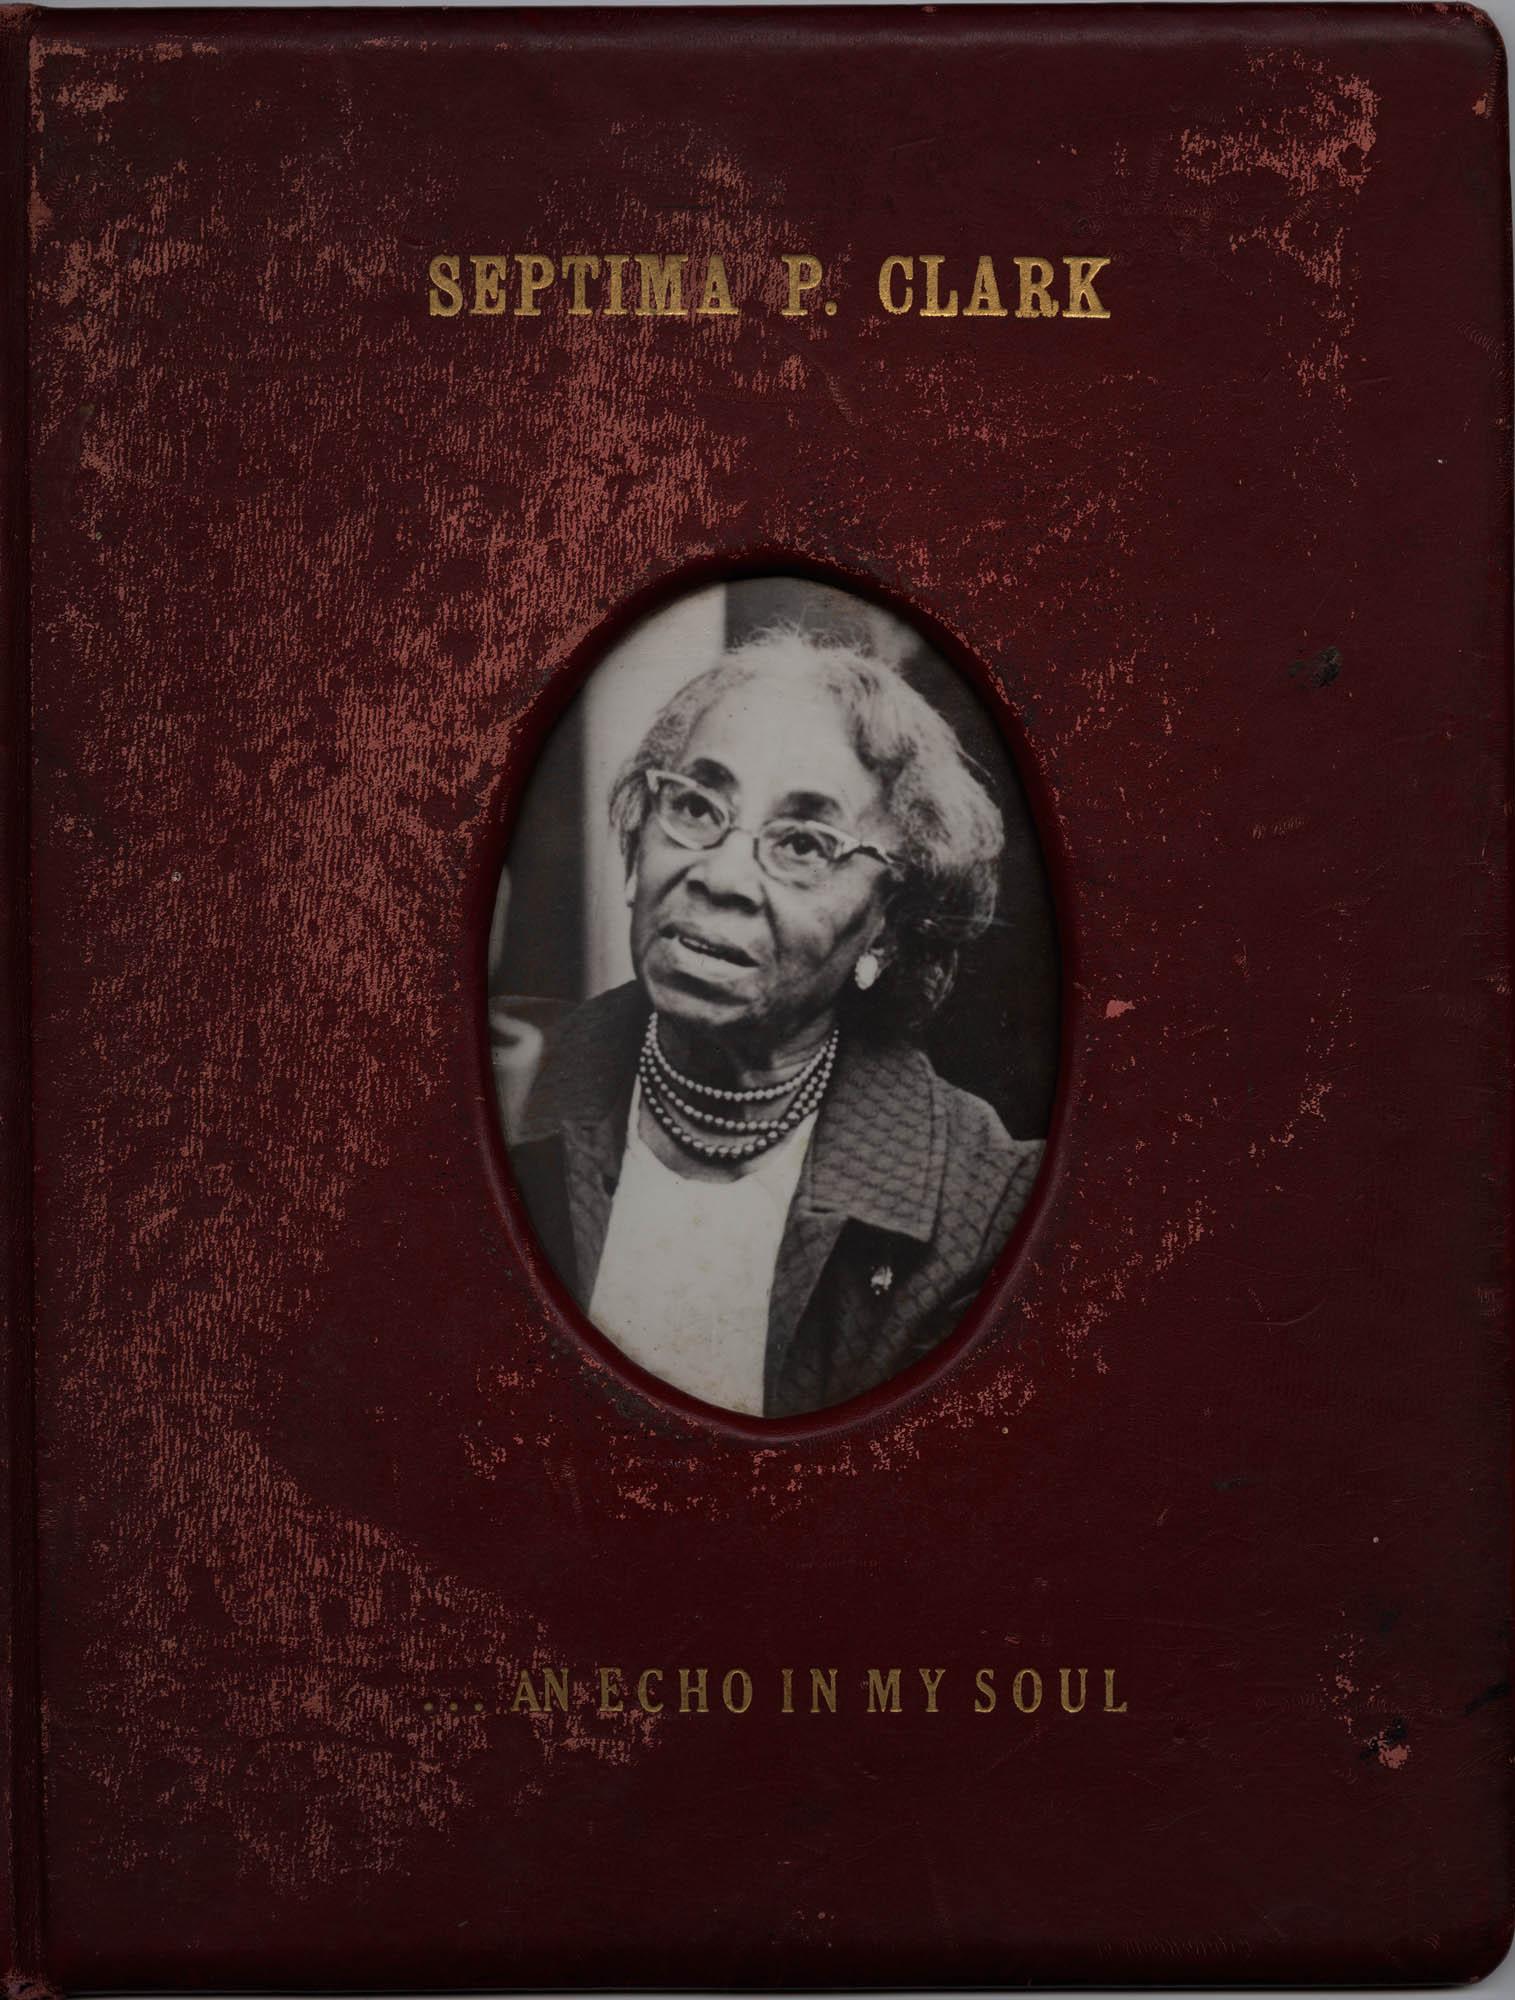 Septima P. Clark Scrapbook